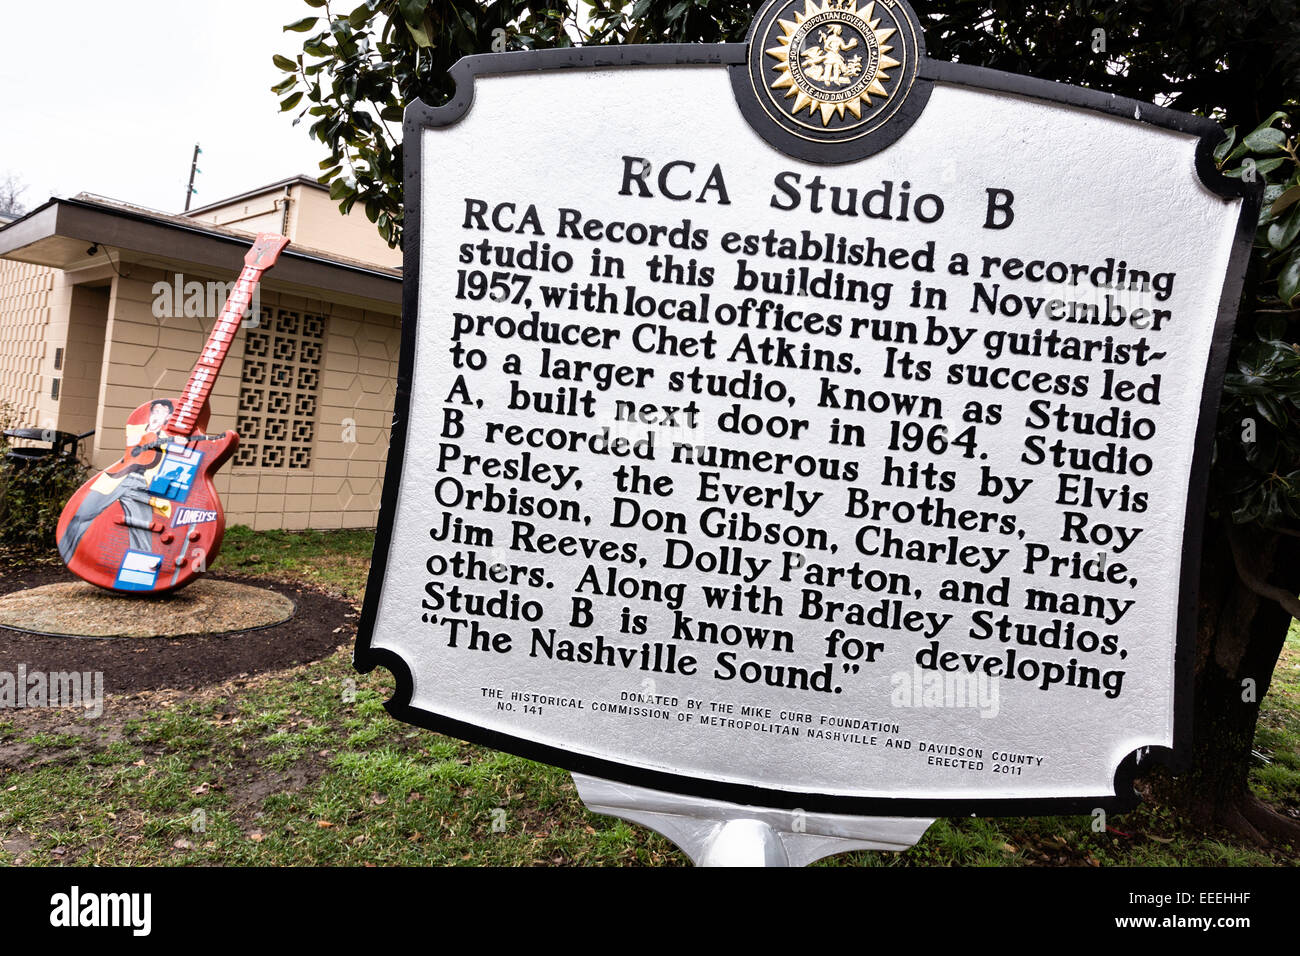 RCA Studio B legendary recording studio in Nashville, TN Stock ...